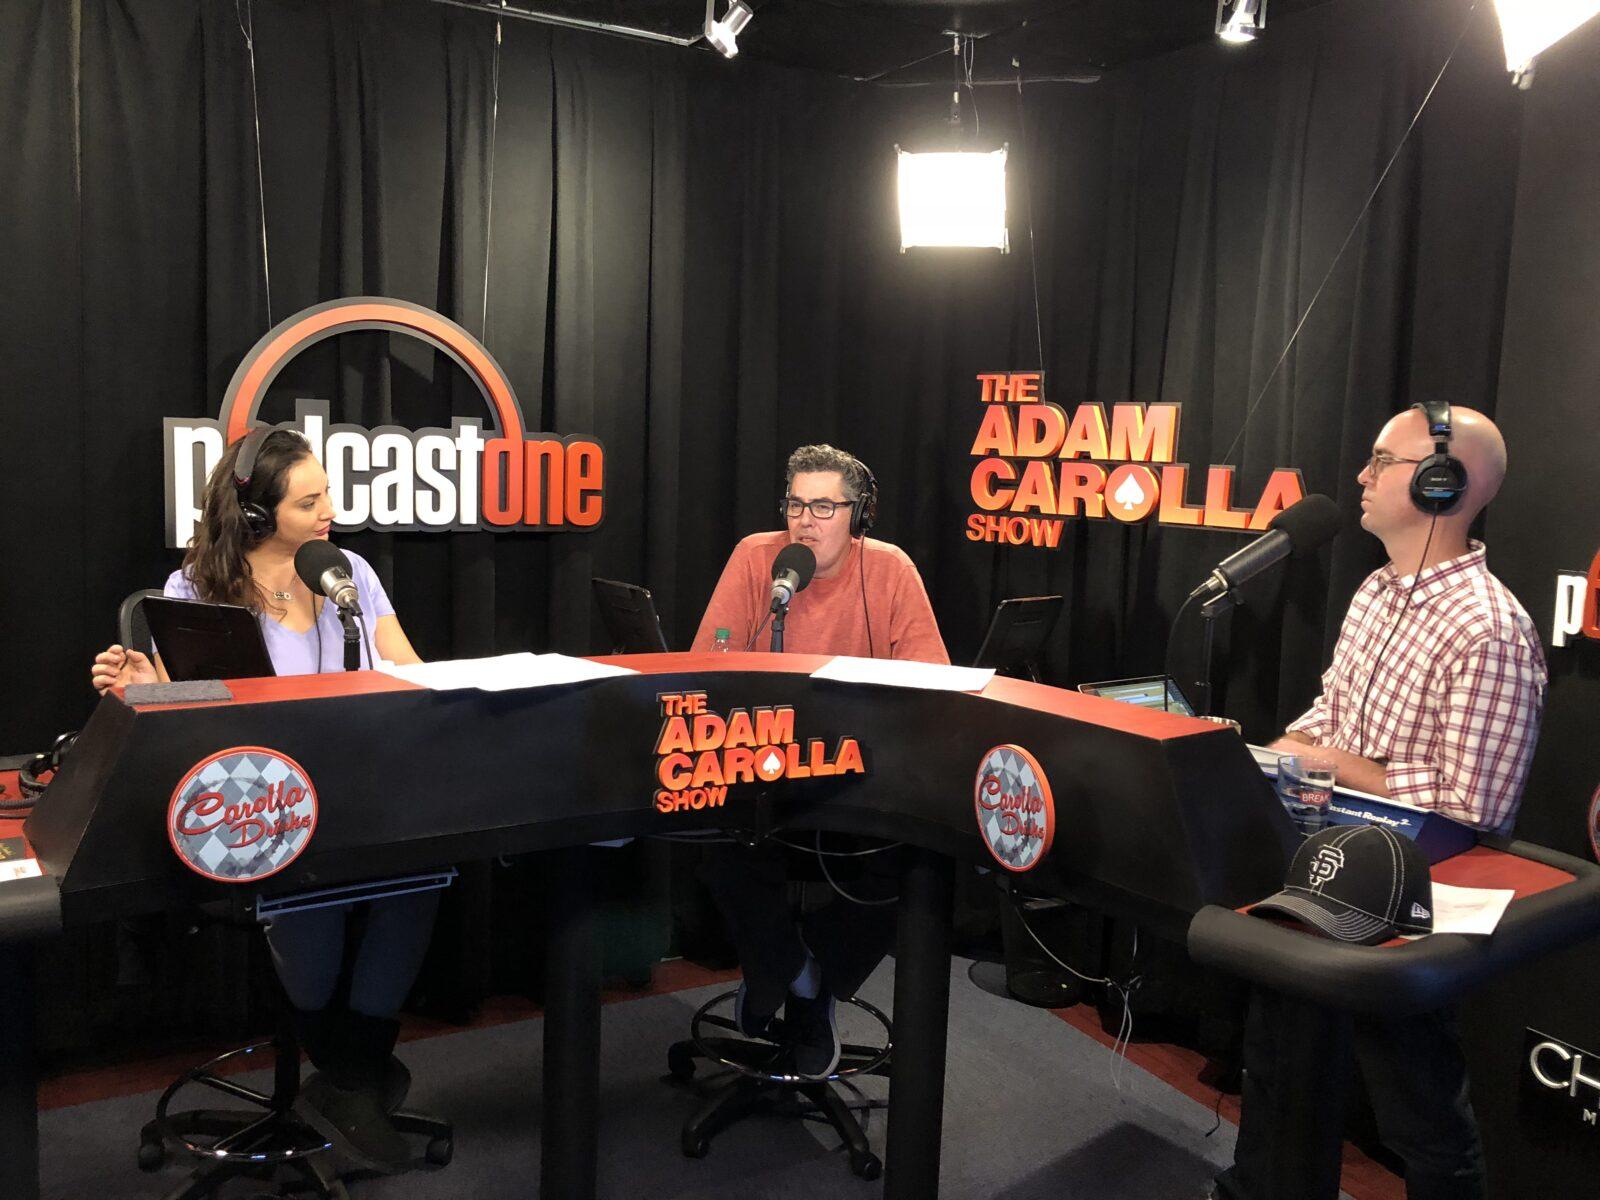 Jim Harbaugh + Totally Topical TiVo Trivia - The Adam